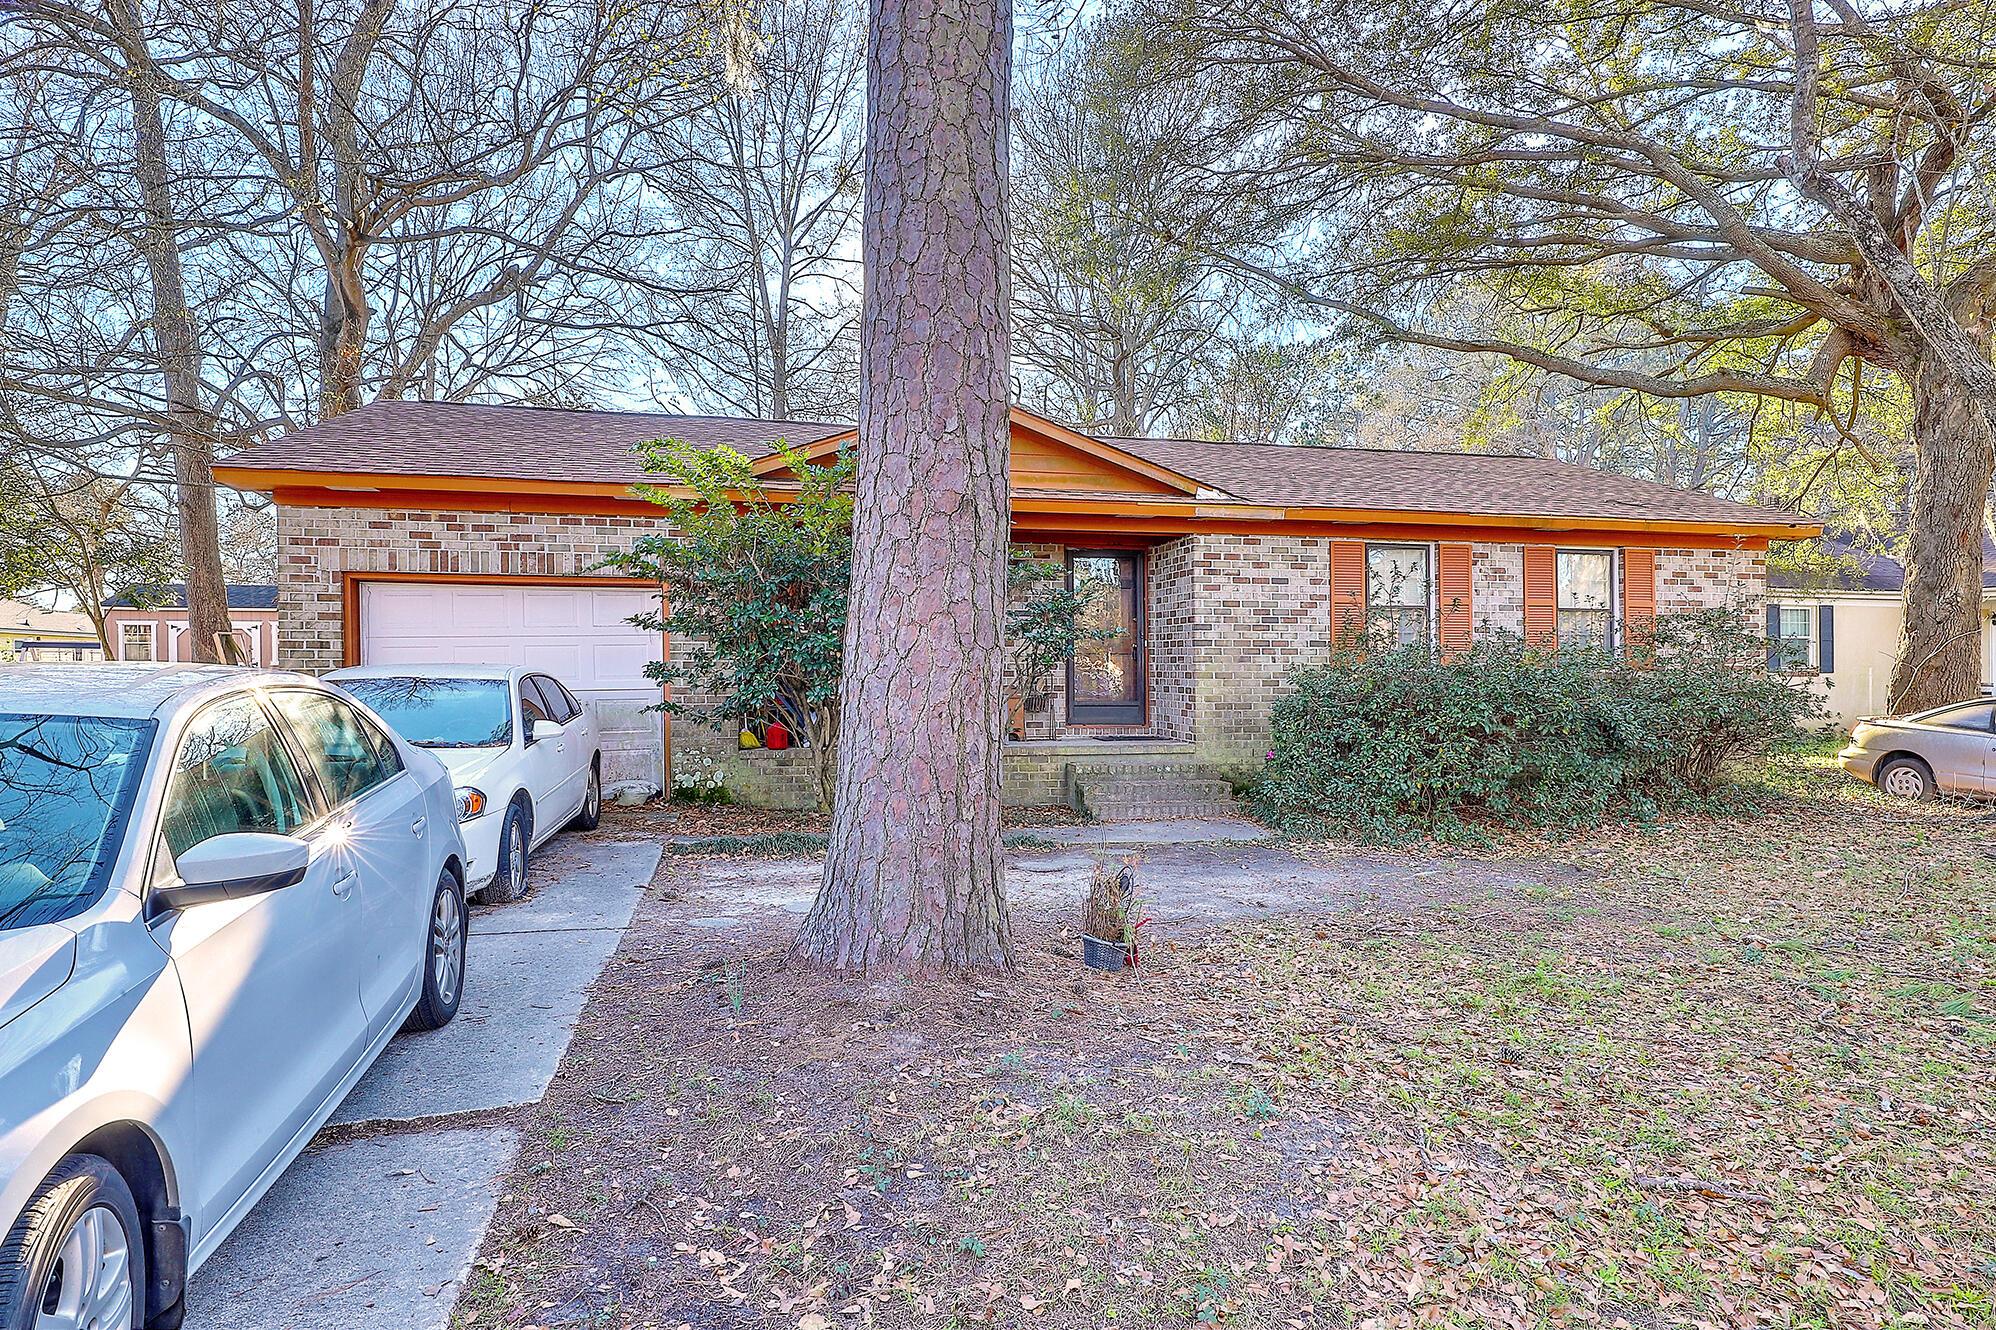 Double Oaks Homes For Sale - 1744 Dogwood, Charleston, SC - 3